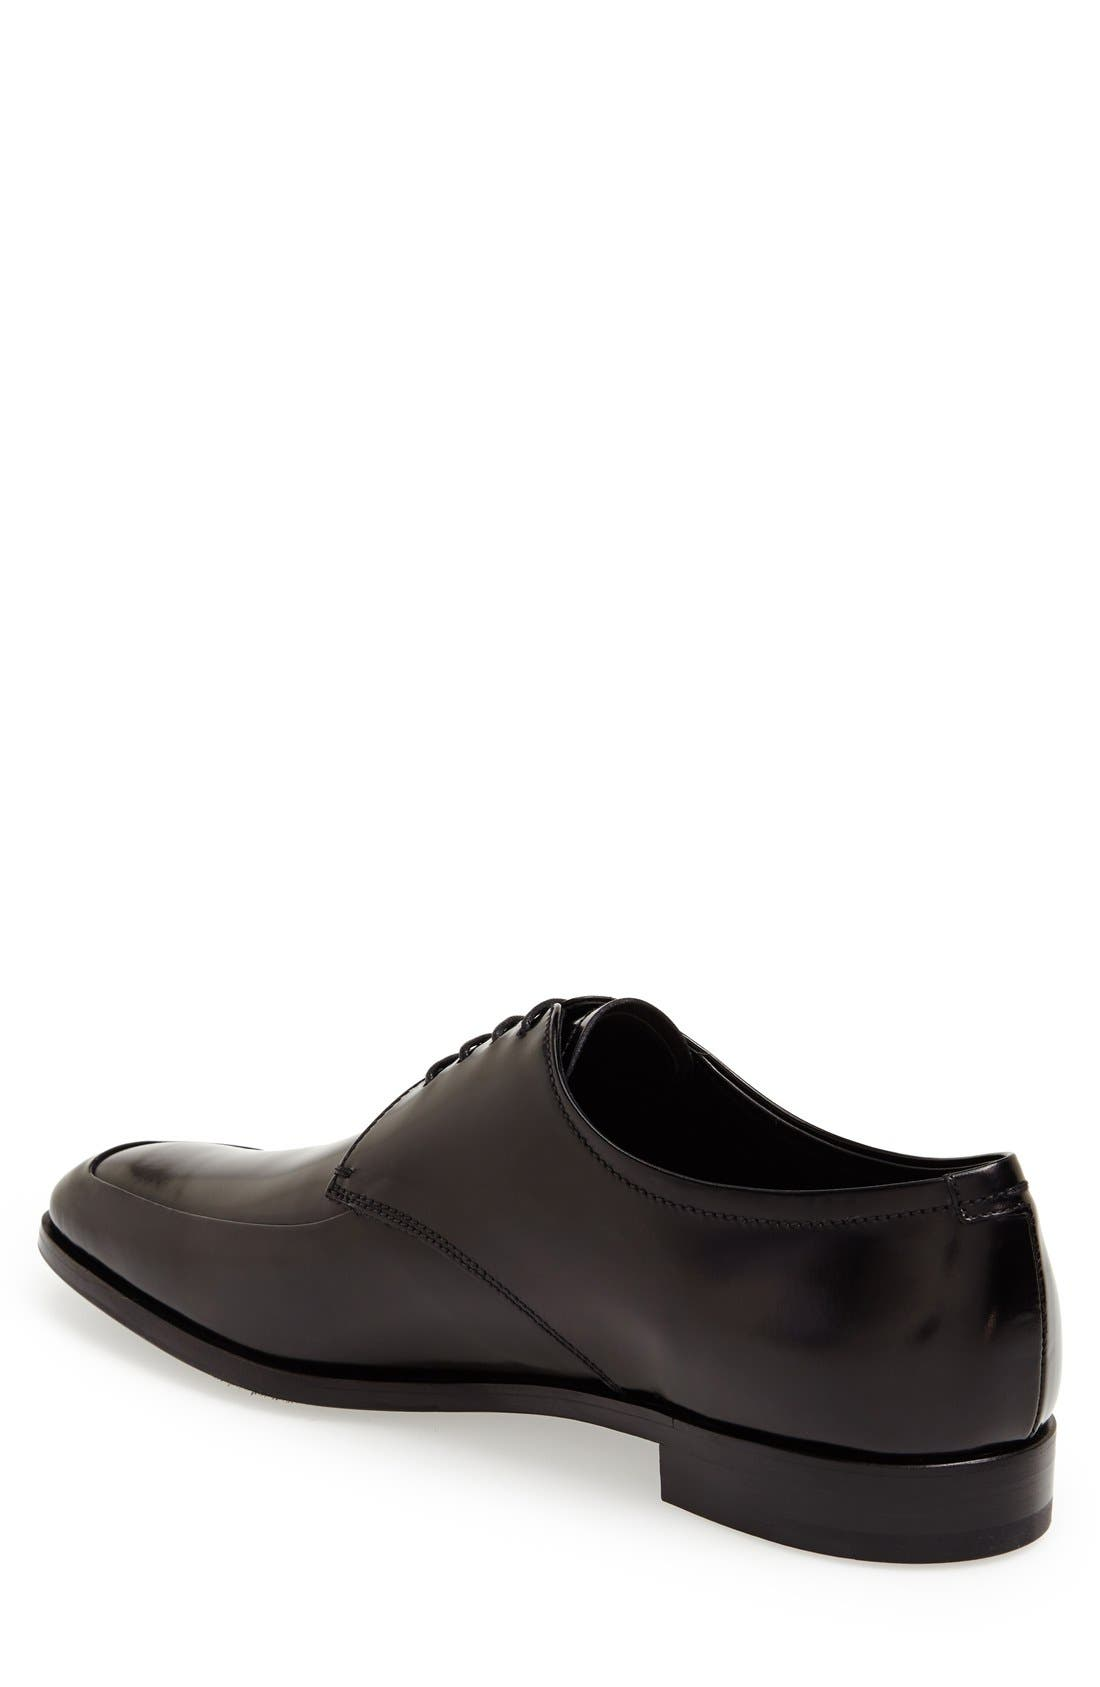 Alternate Image 2  - Prada High Shine Apron Toe Oxford (Men)